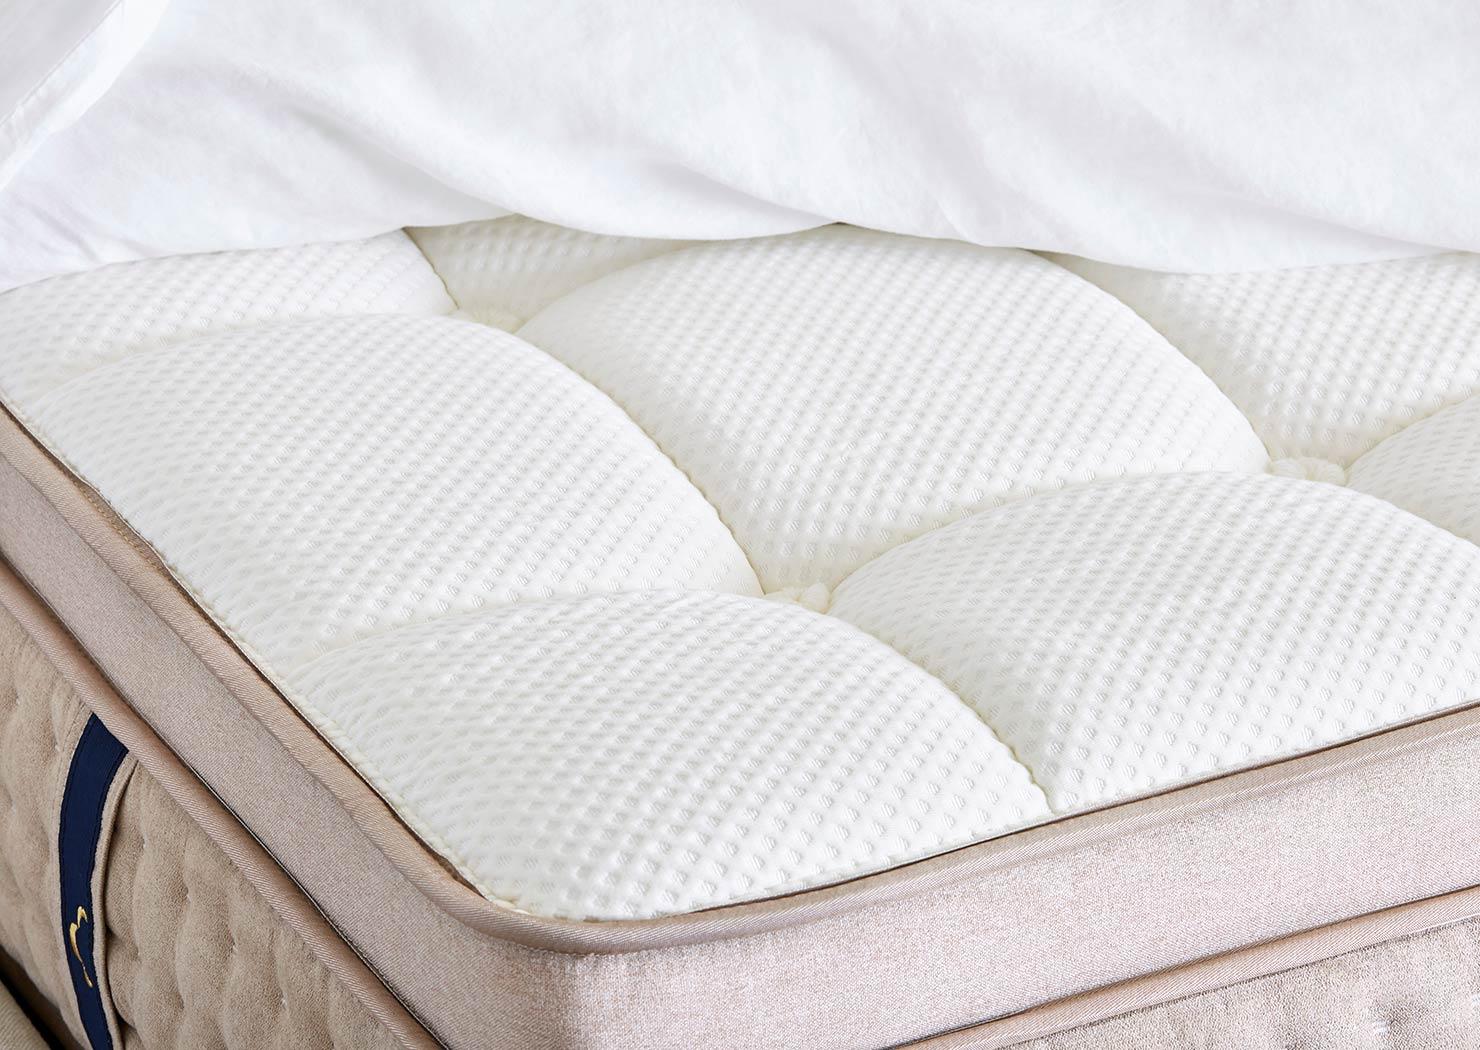 Soft DreamCloud bed